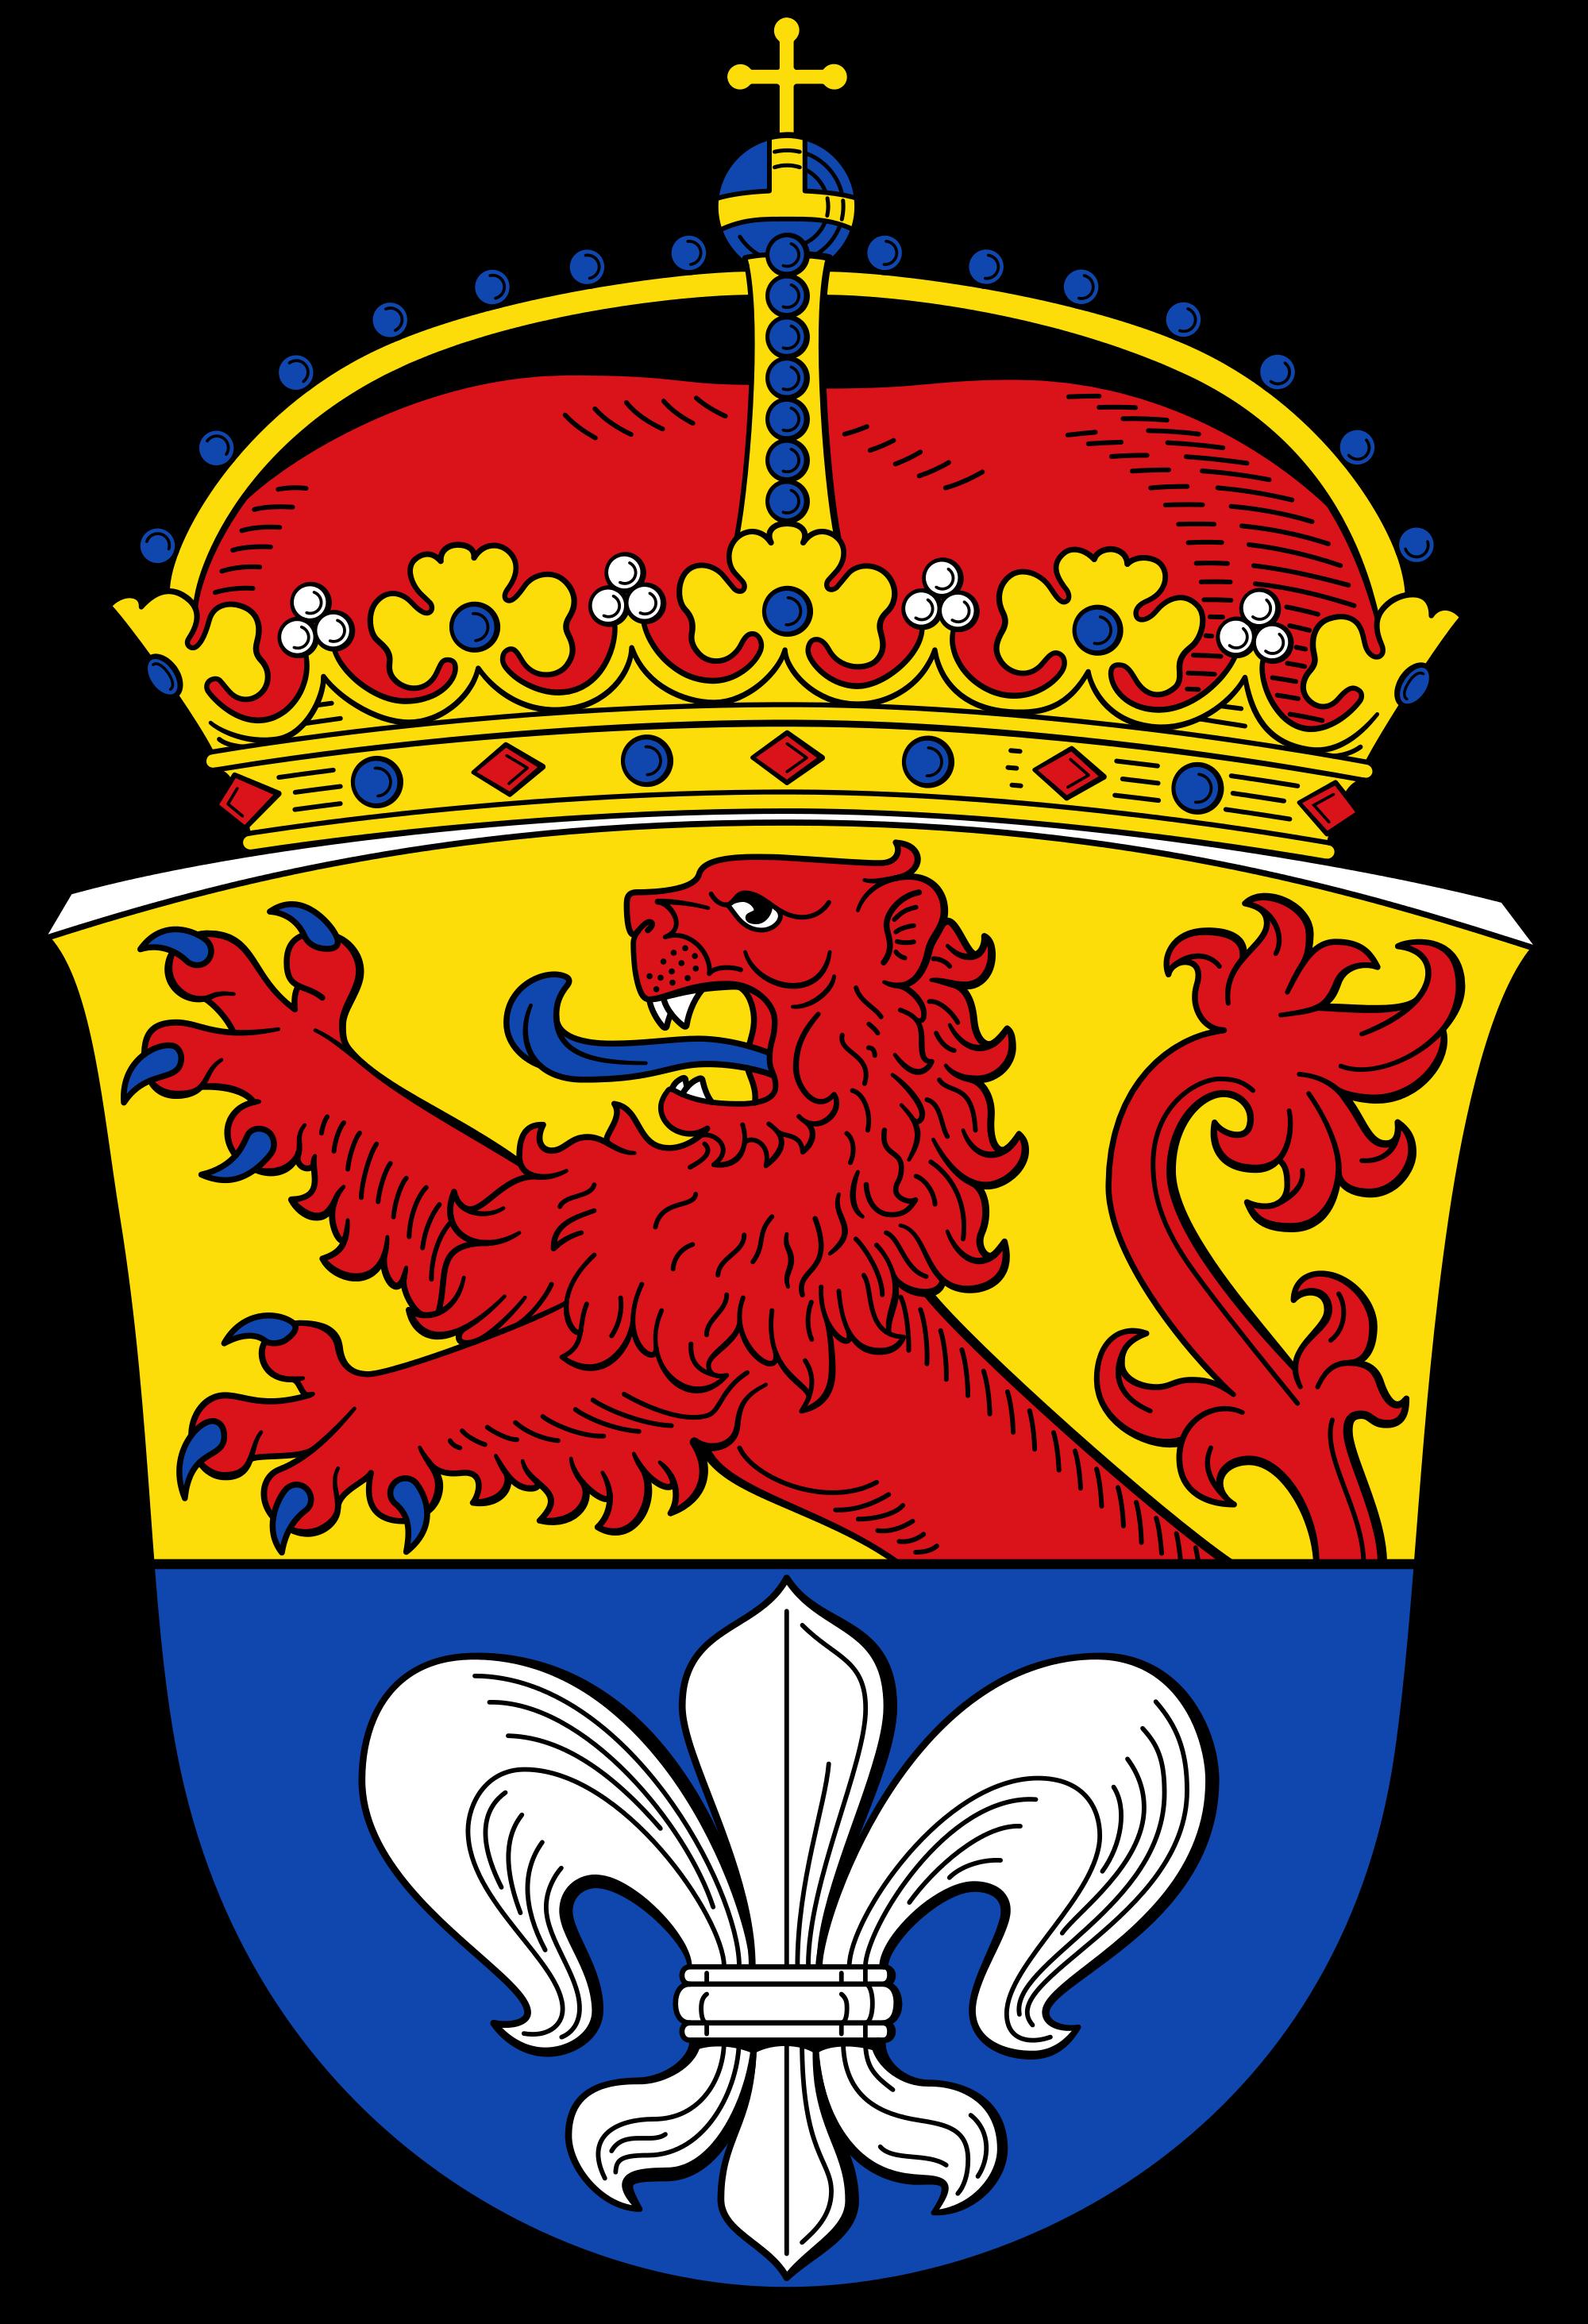 File:Wappen Darmstadt.svg.